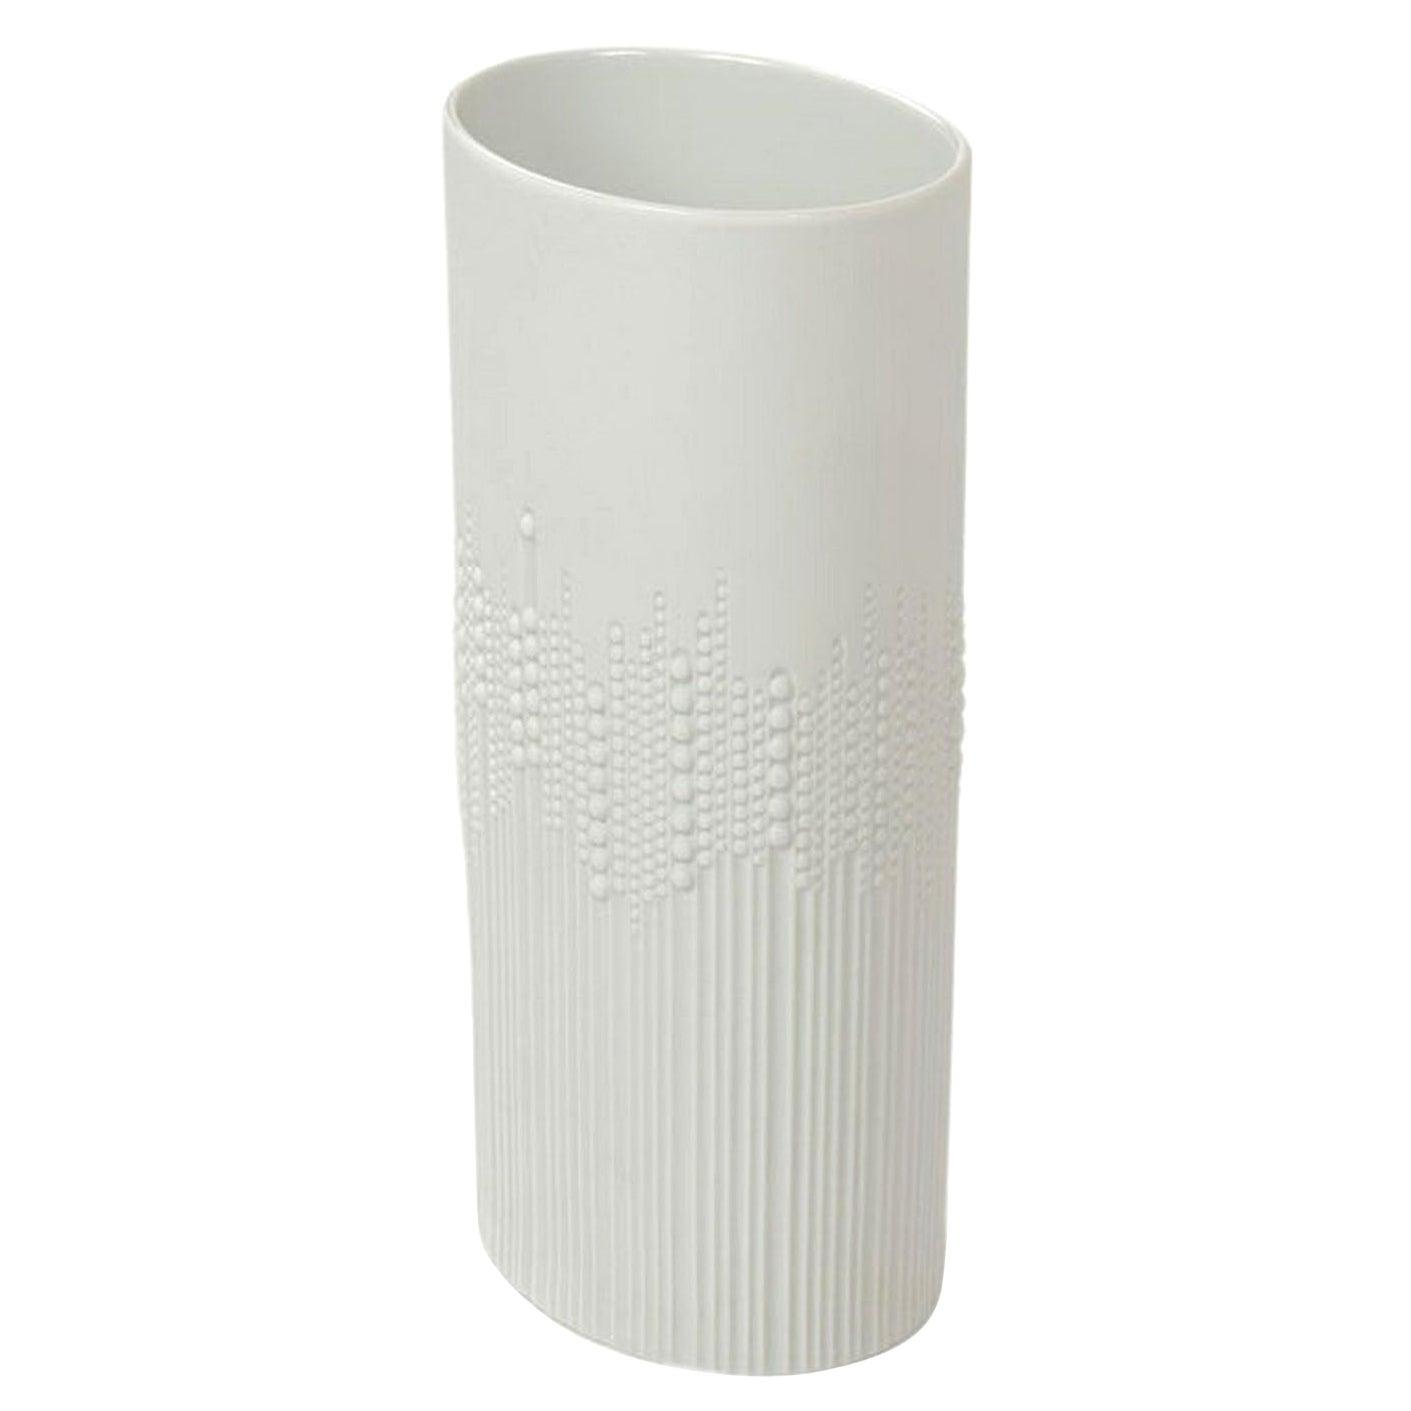 German Porcelain Vase by Tapio Wirkkala for Rosenthal, 1980s